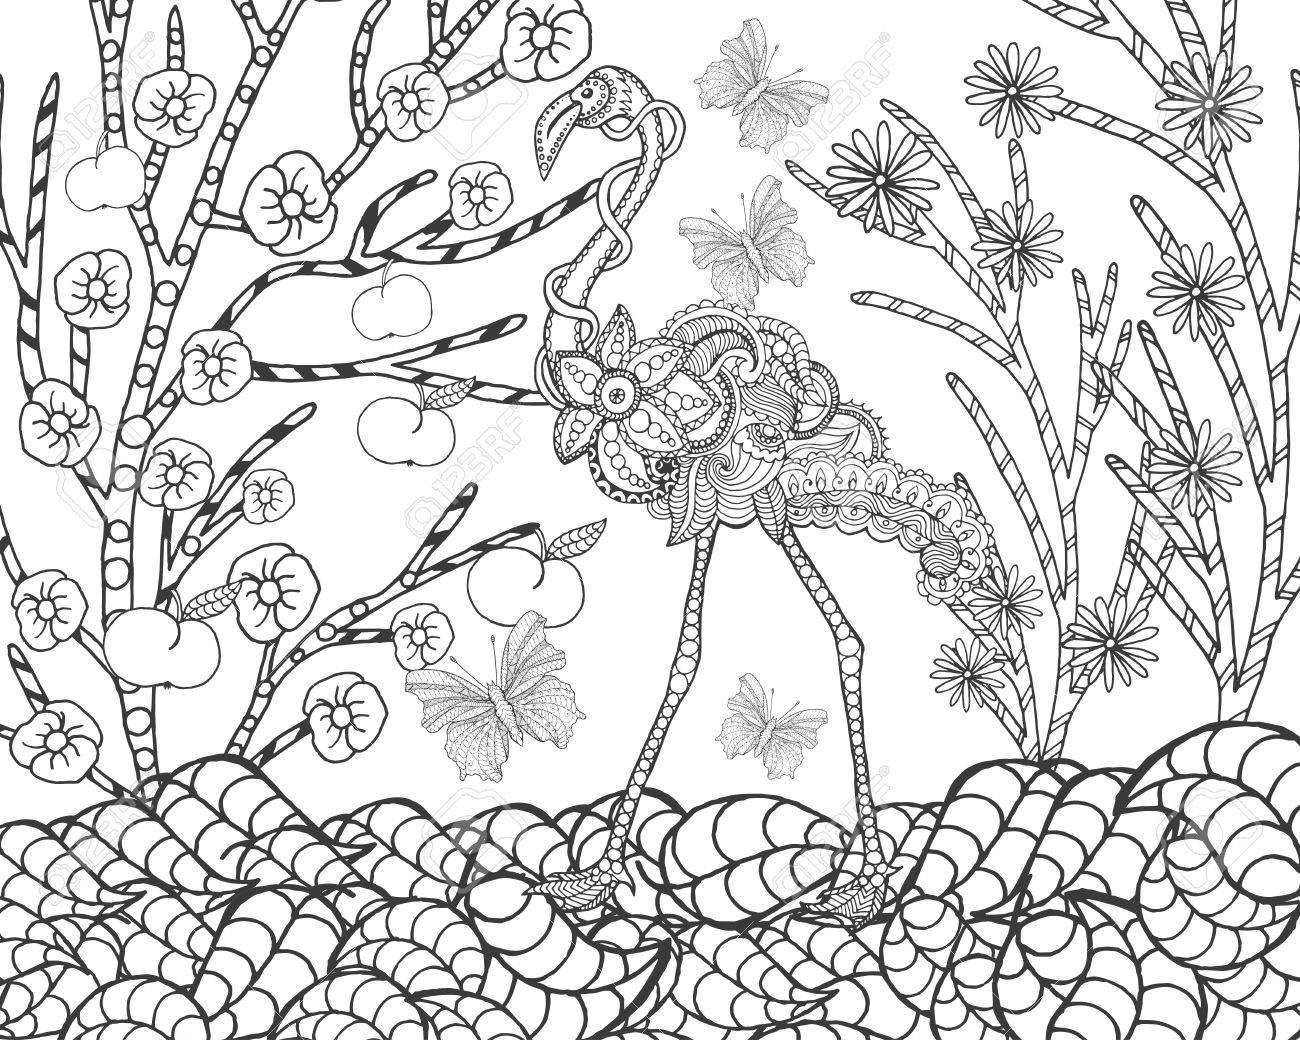 1300x1040 Flamingo In Flower Garden. Animals. Hand Drawn Doodle. Ethnic